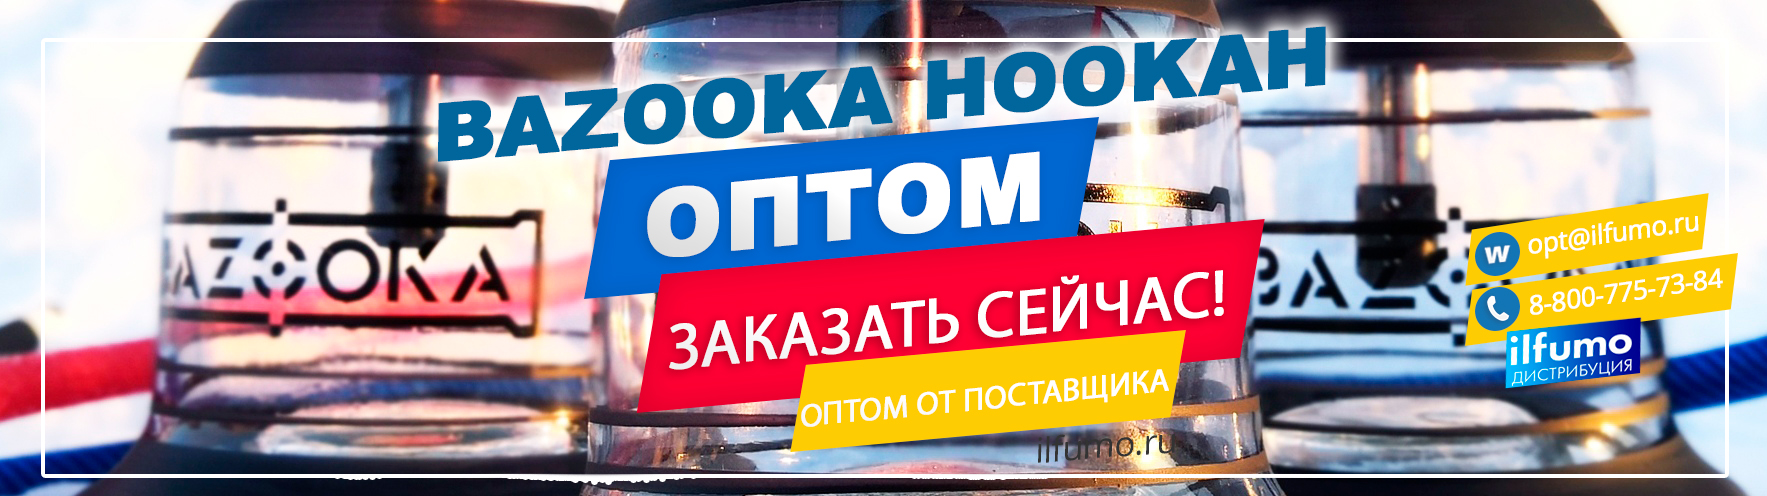 kupit bazooka hookah optom - Кальян Bazooka Hookah